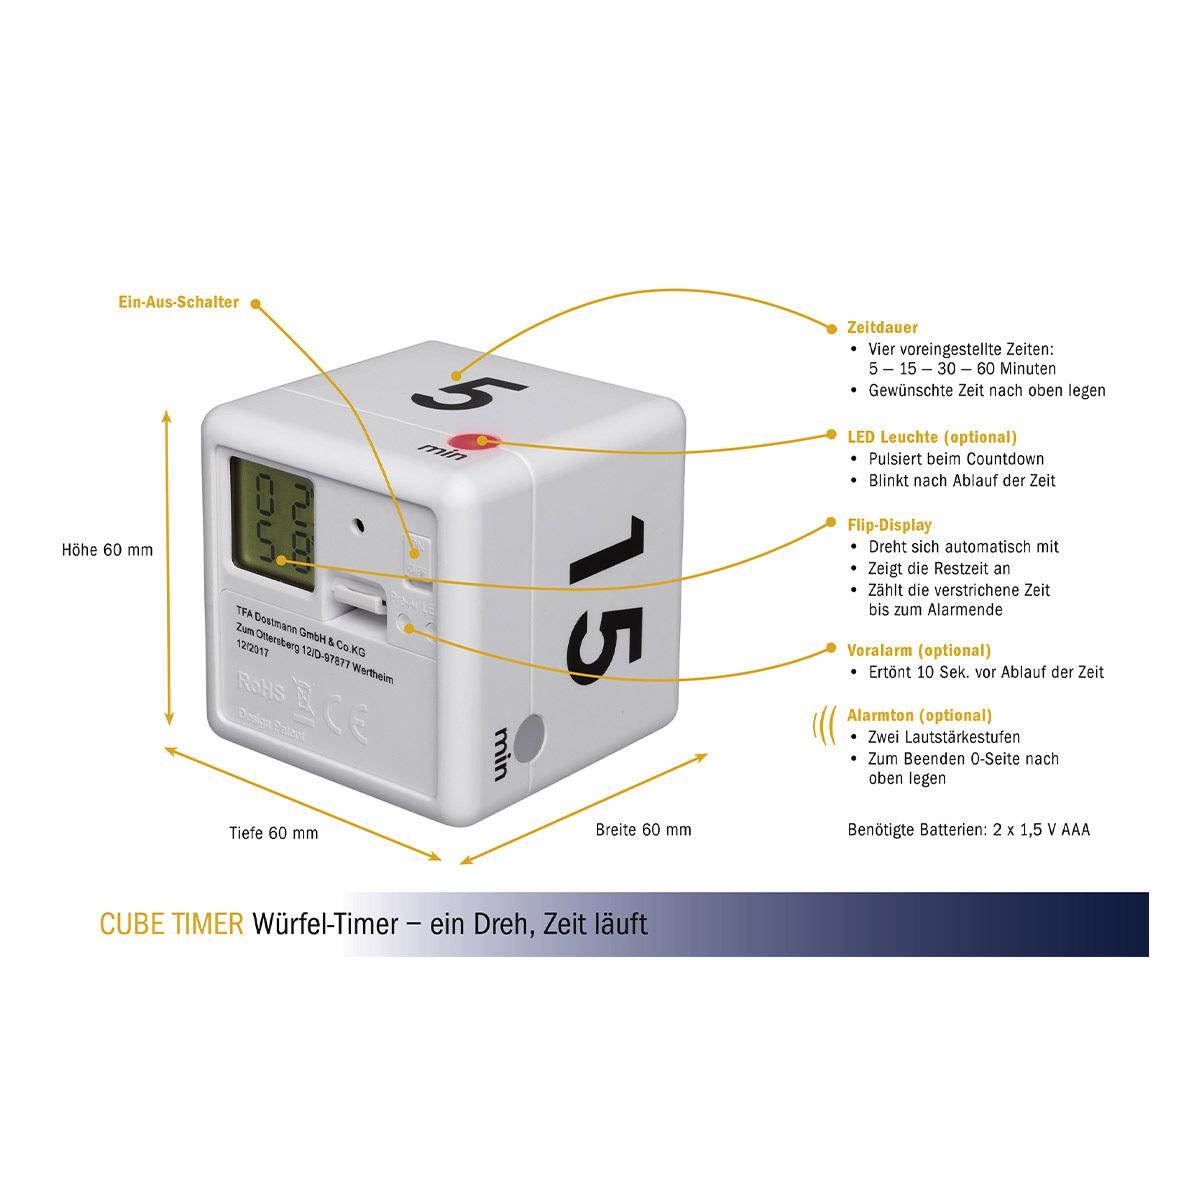 38-2032-02-digitaler-würfel-timer-cube-timer-abmessungen-1200x1200px.jpg